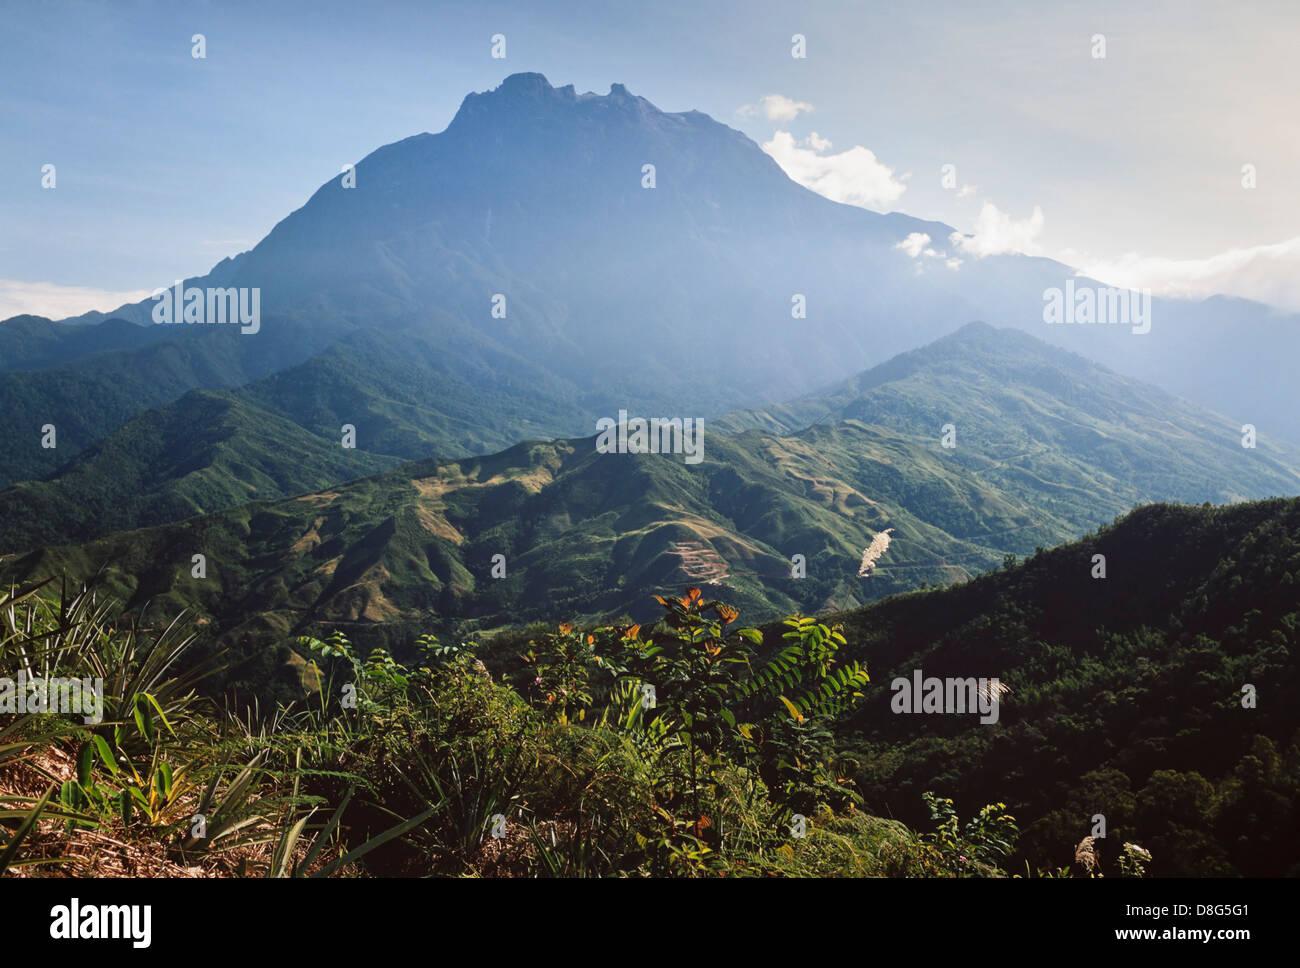 Gunung Kinabalu, Borneo, Sabah, East Malaysia, highest mountain in S.E.Asia, 4,095 m (13,435 ft) - Stock Image